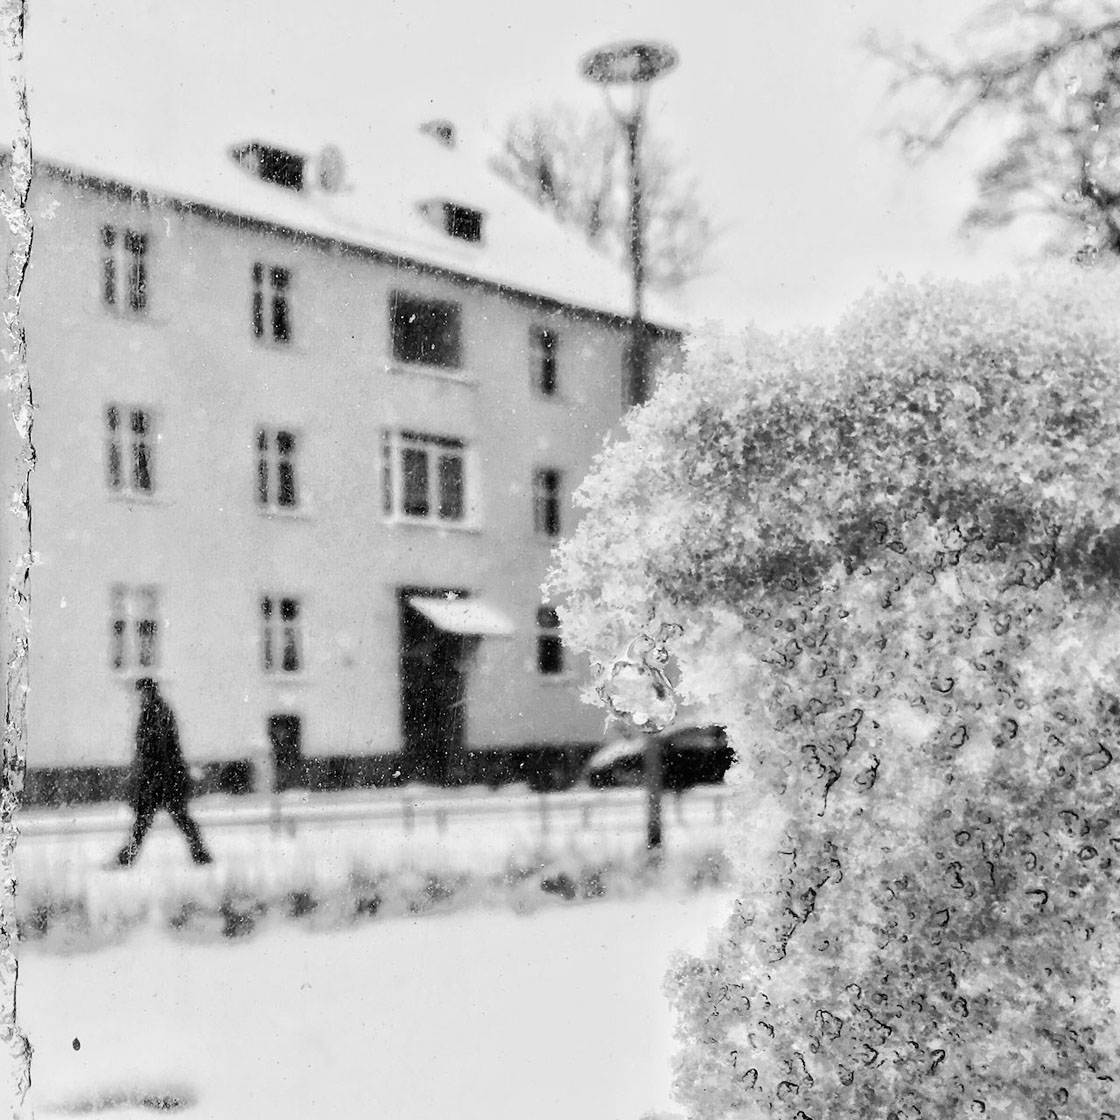 Winter iPhone Photos 2016 1